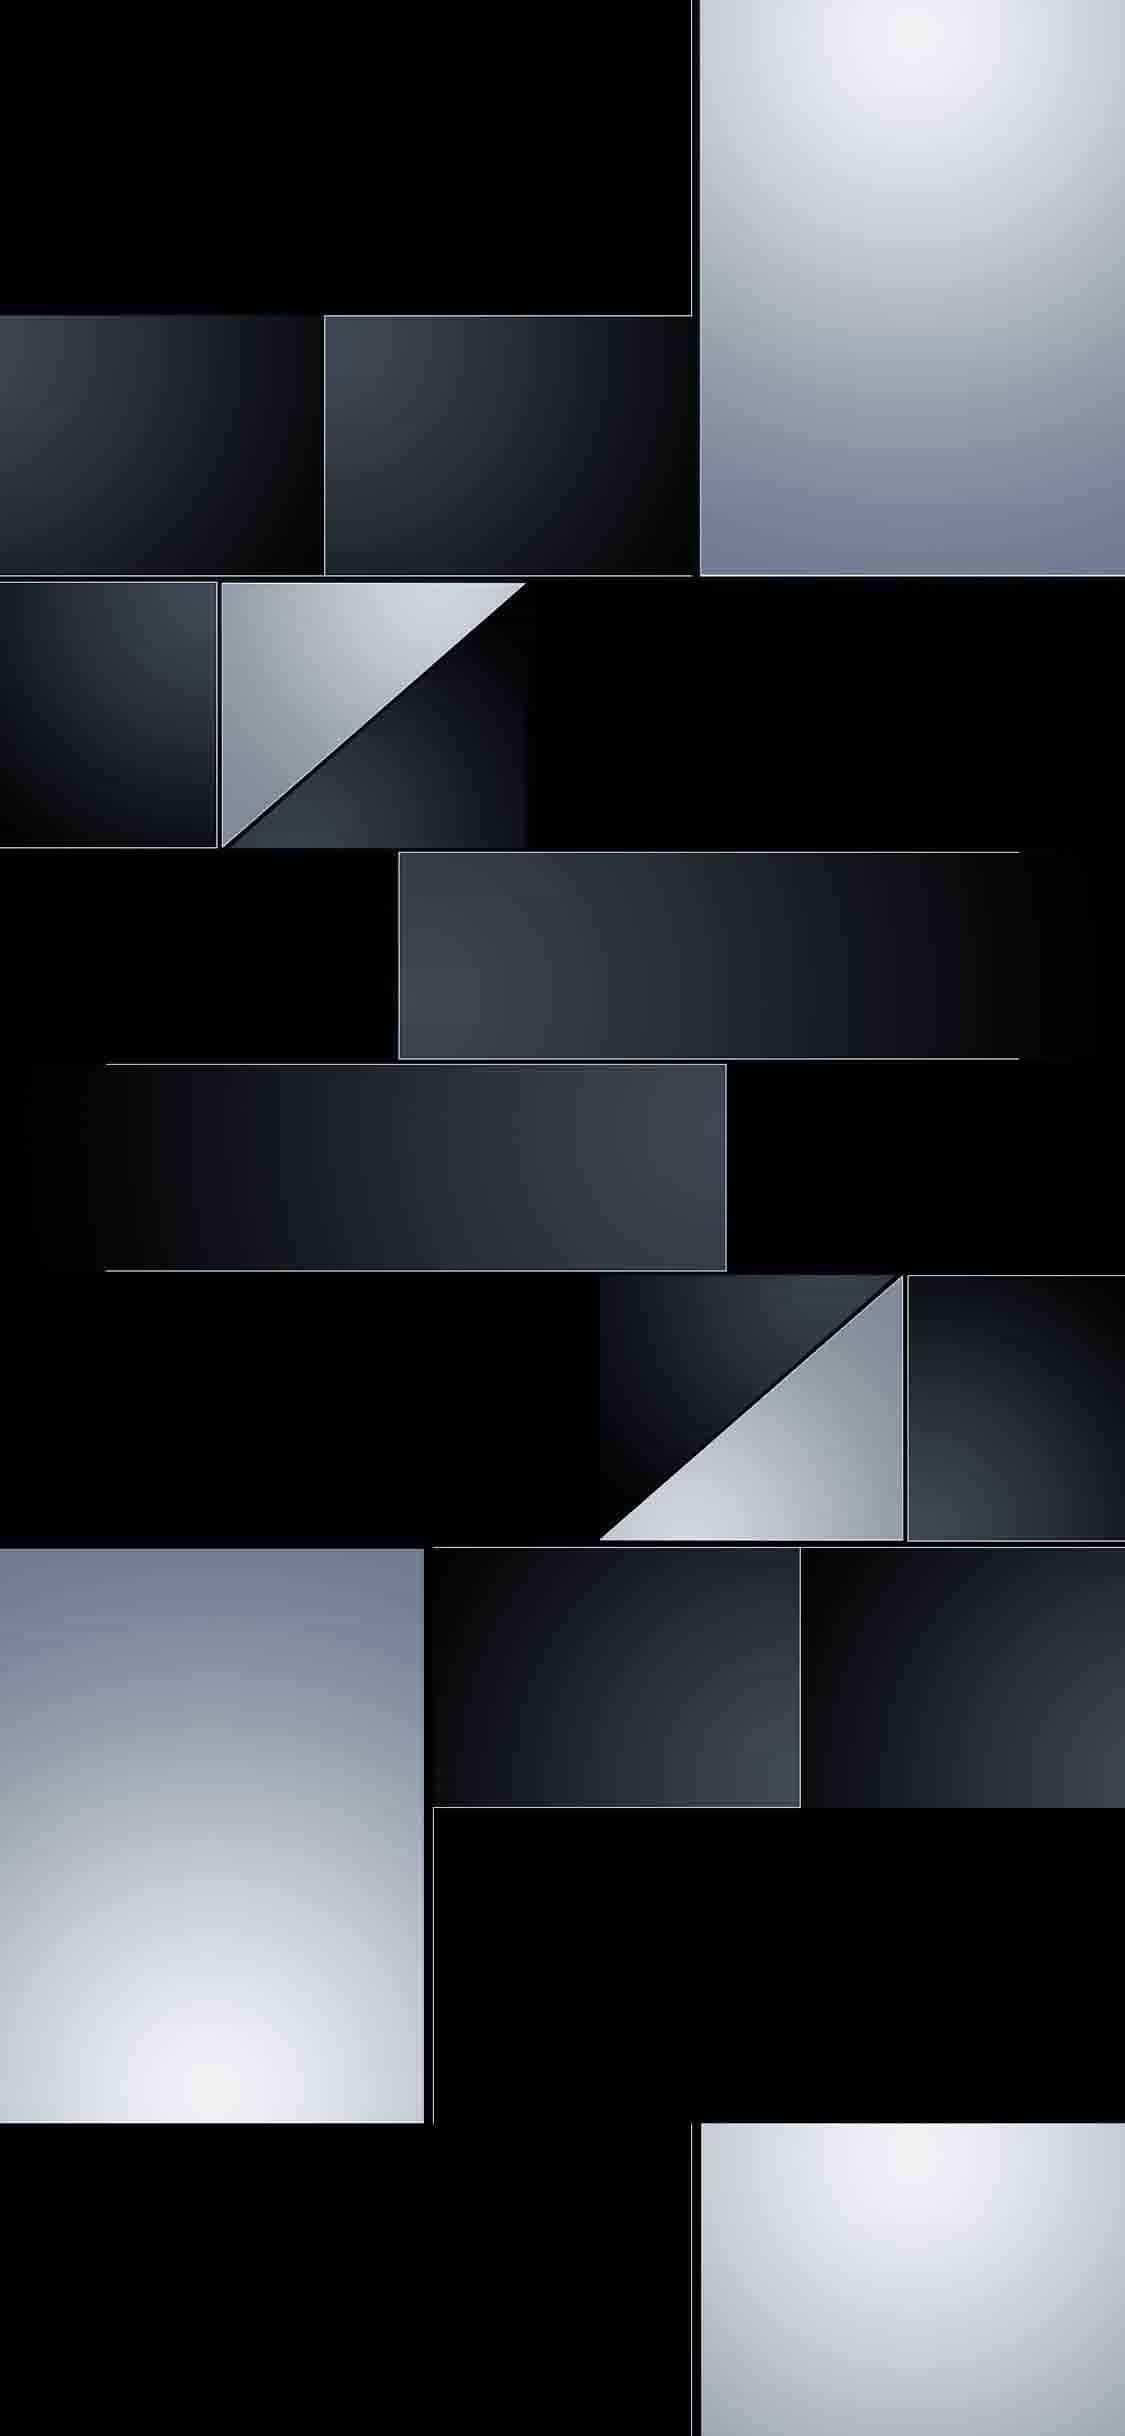 خلفيات ايفون Iphone Lockscreen Wallpaper Iphone Homescreen Wallpaper Apple Wallpaper